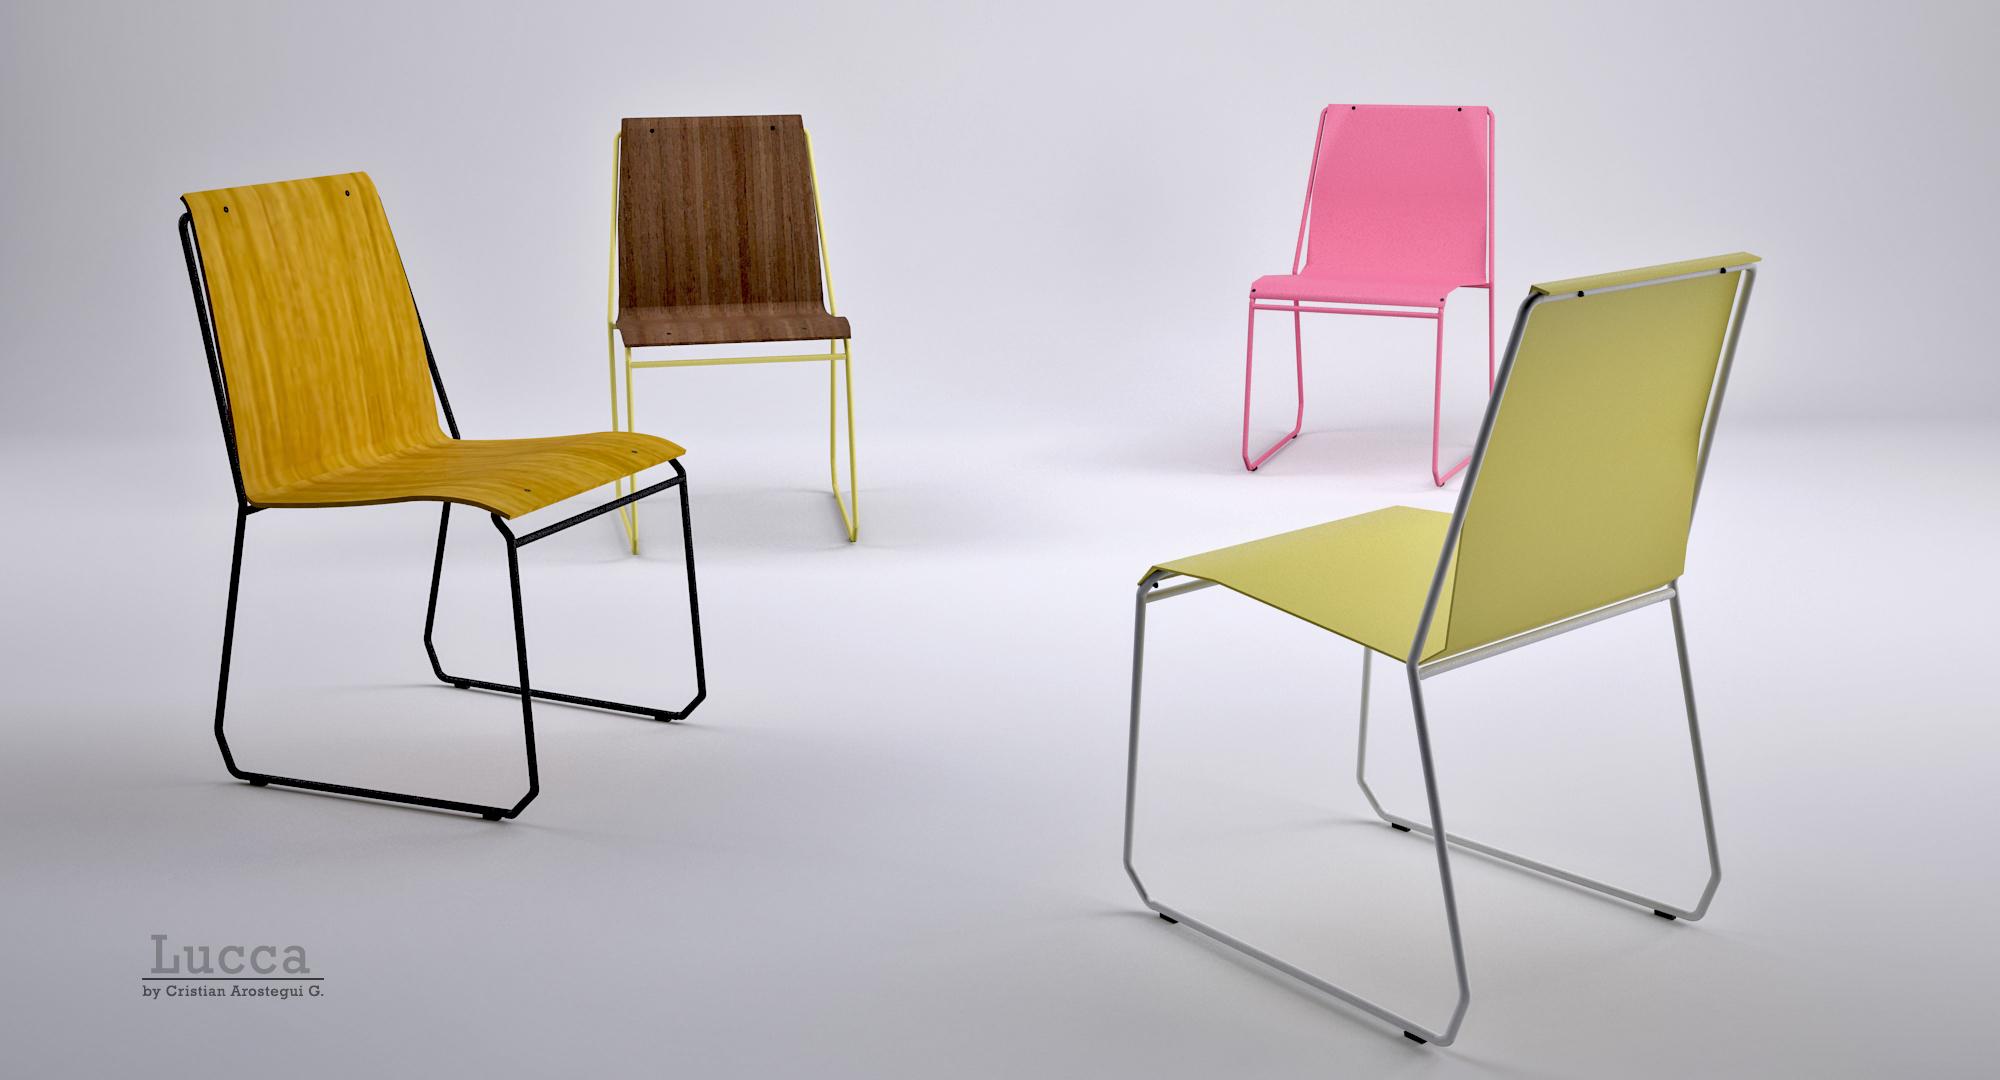 Lucca chair 4- cristian Arostegui- formabilio contest- Arostegui Studio.jpg